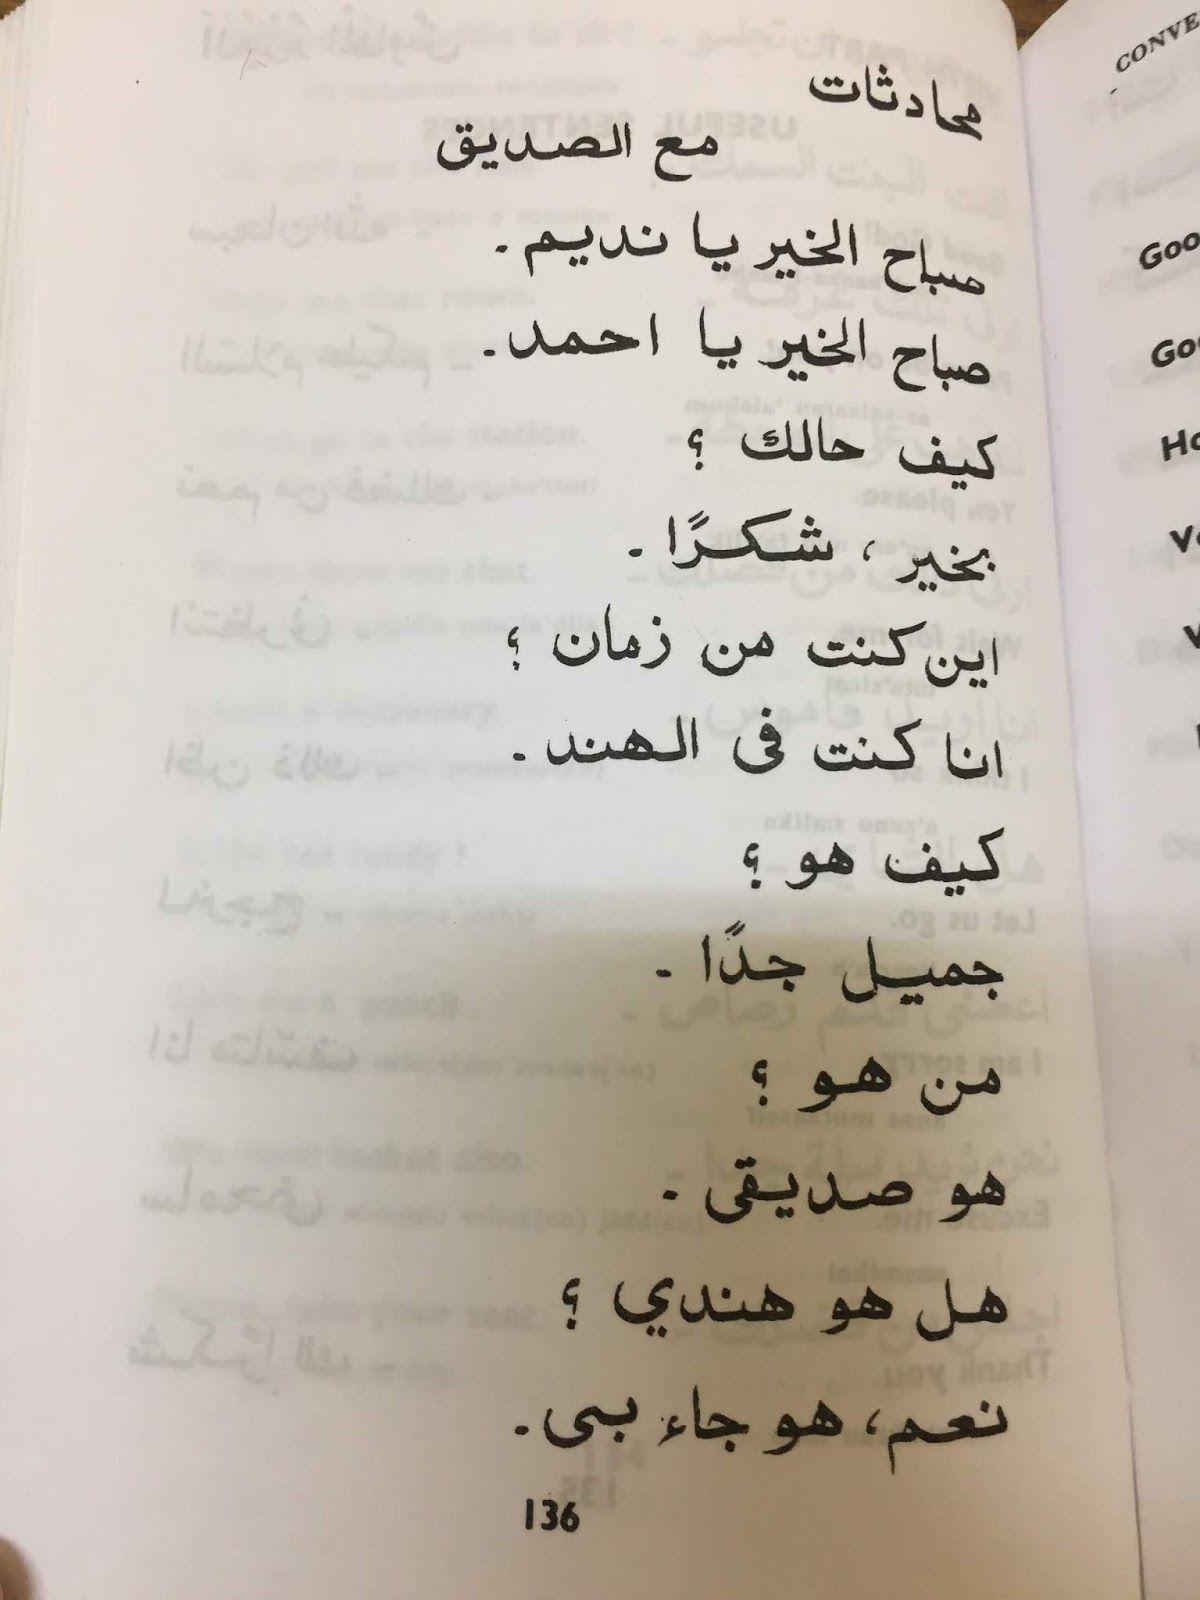 Learning Arabic Learning Arabic 22 In 2020 Learning Arabic Learning Arabic